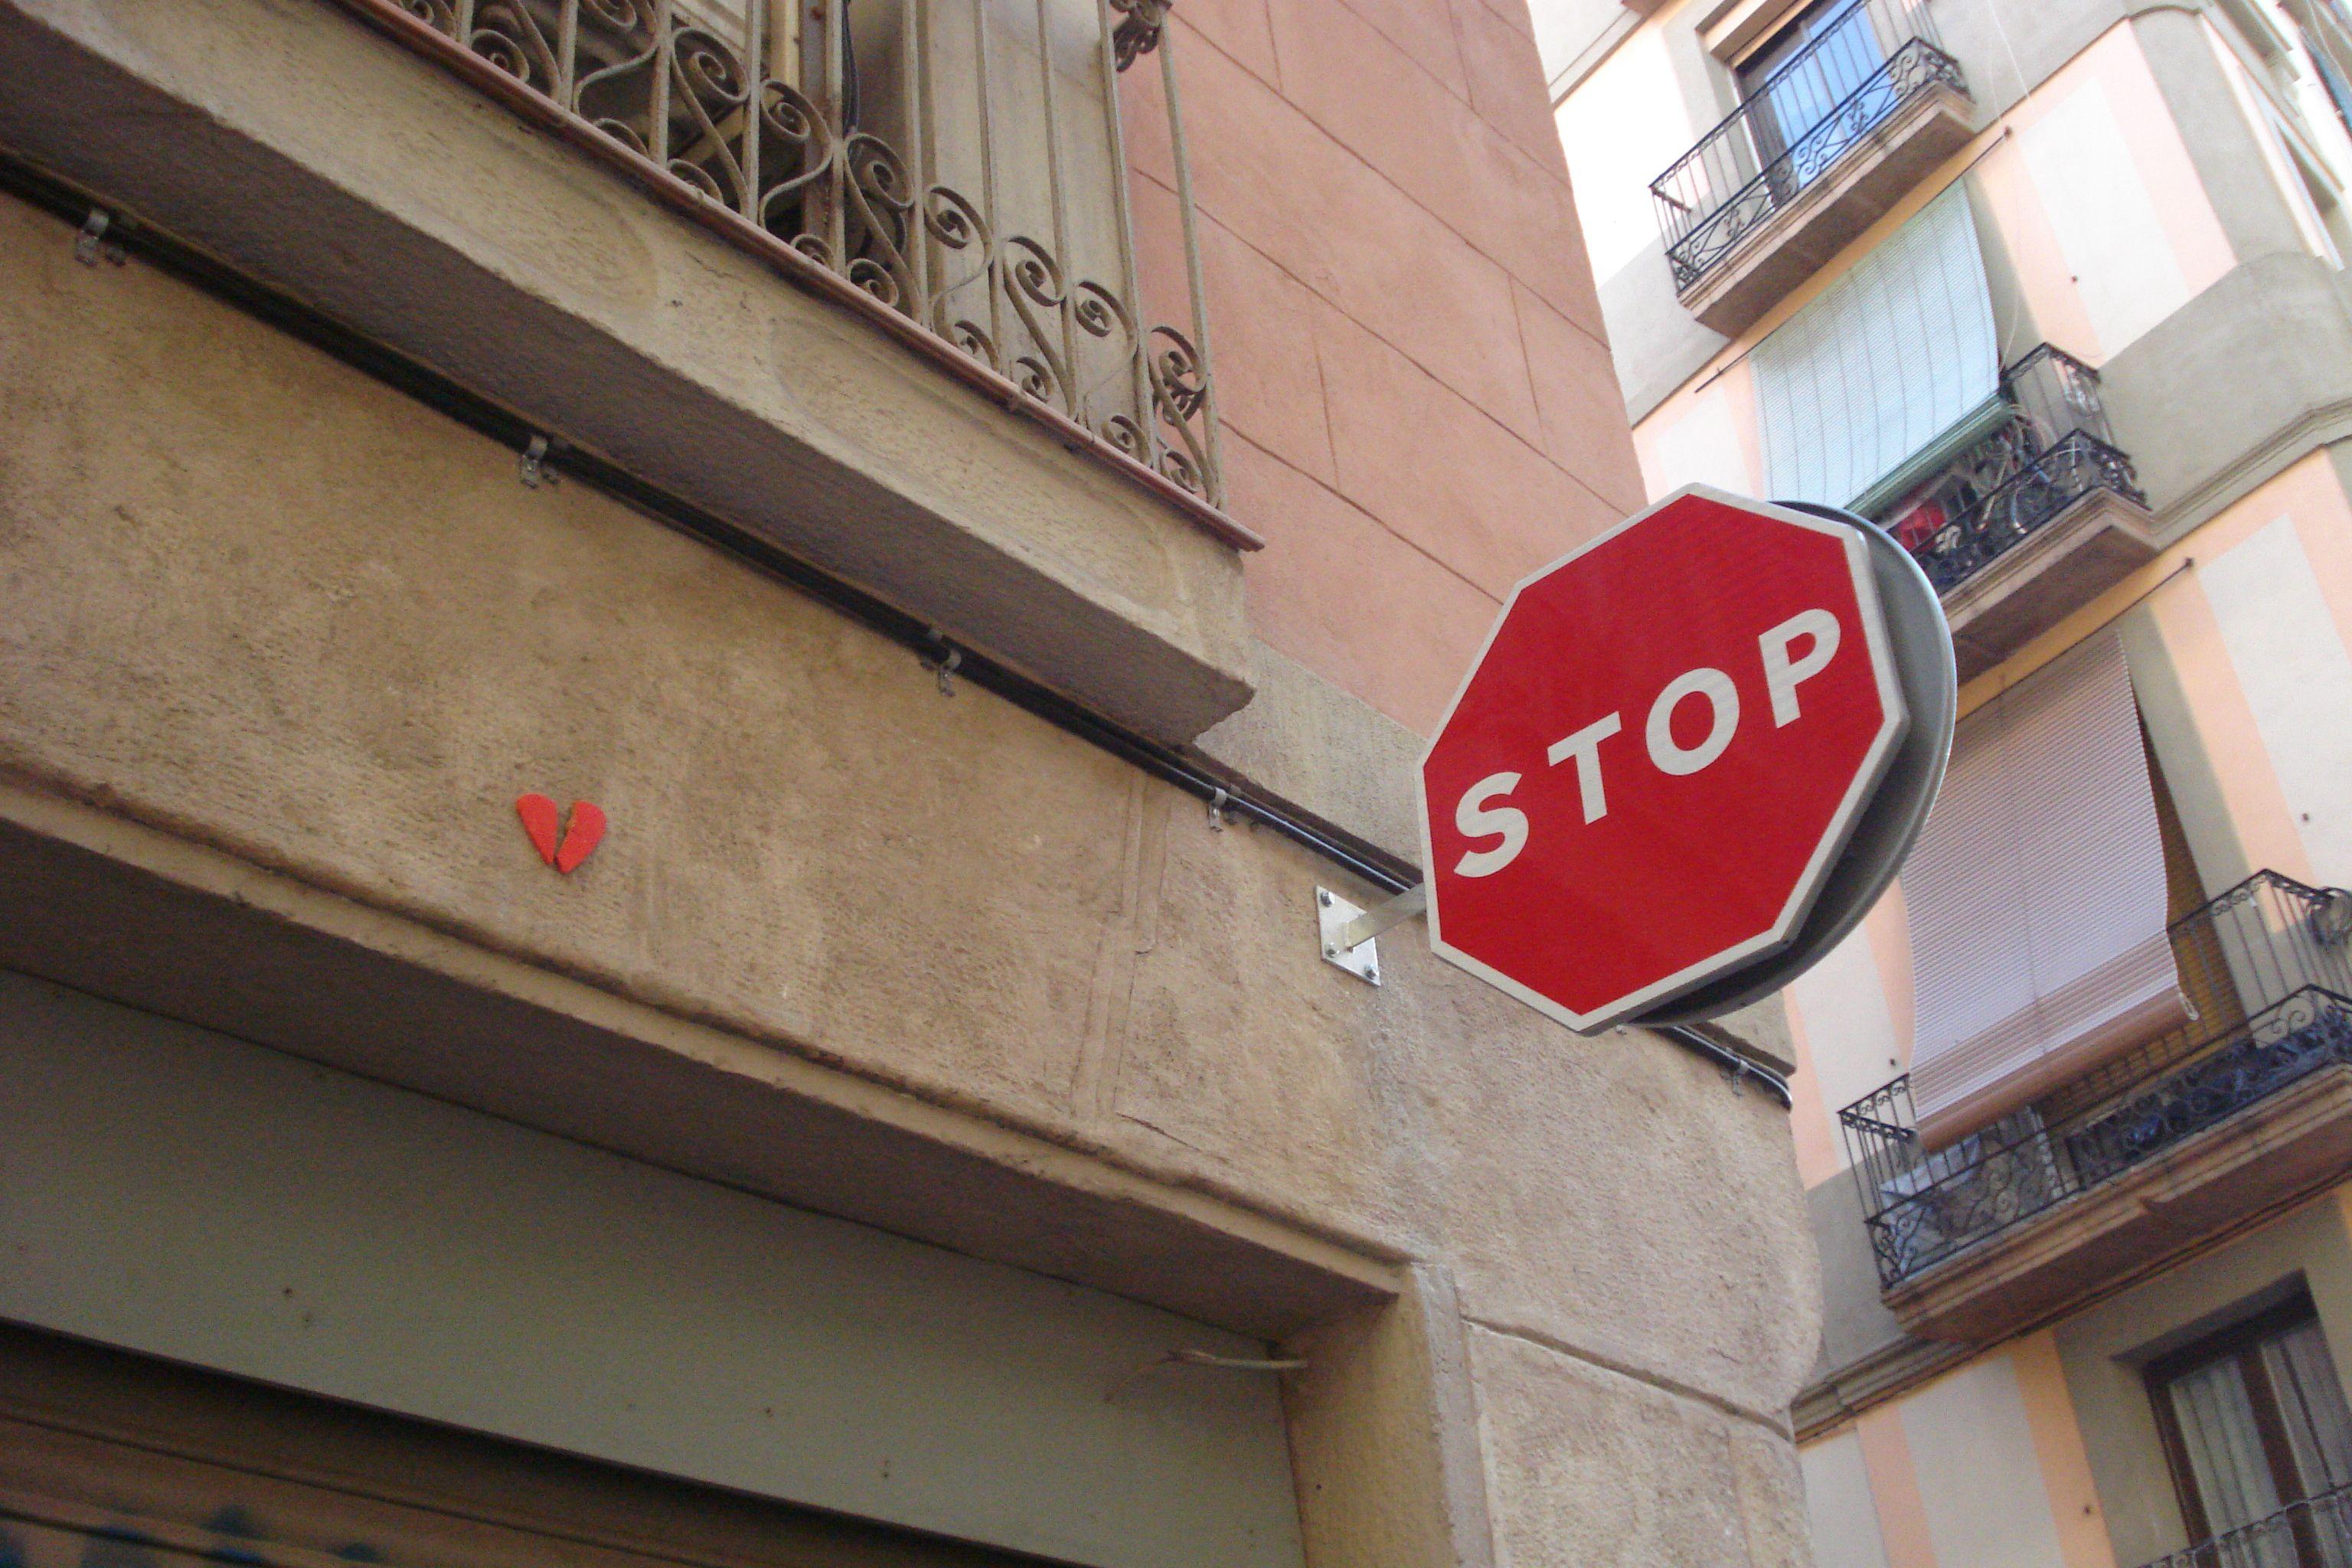 #streetart #artecallejero #arteurbana #penelopemaldonado #streetartbcn #corazones #hearts #brokenhearts #barcelona #corazonesrotos